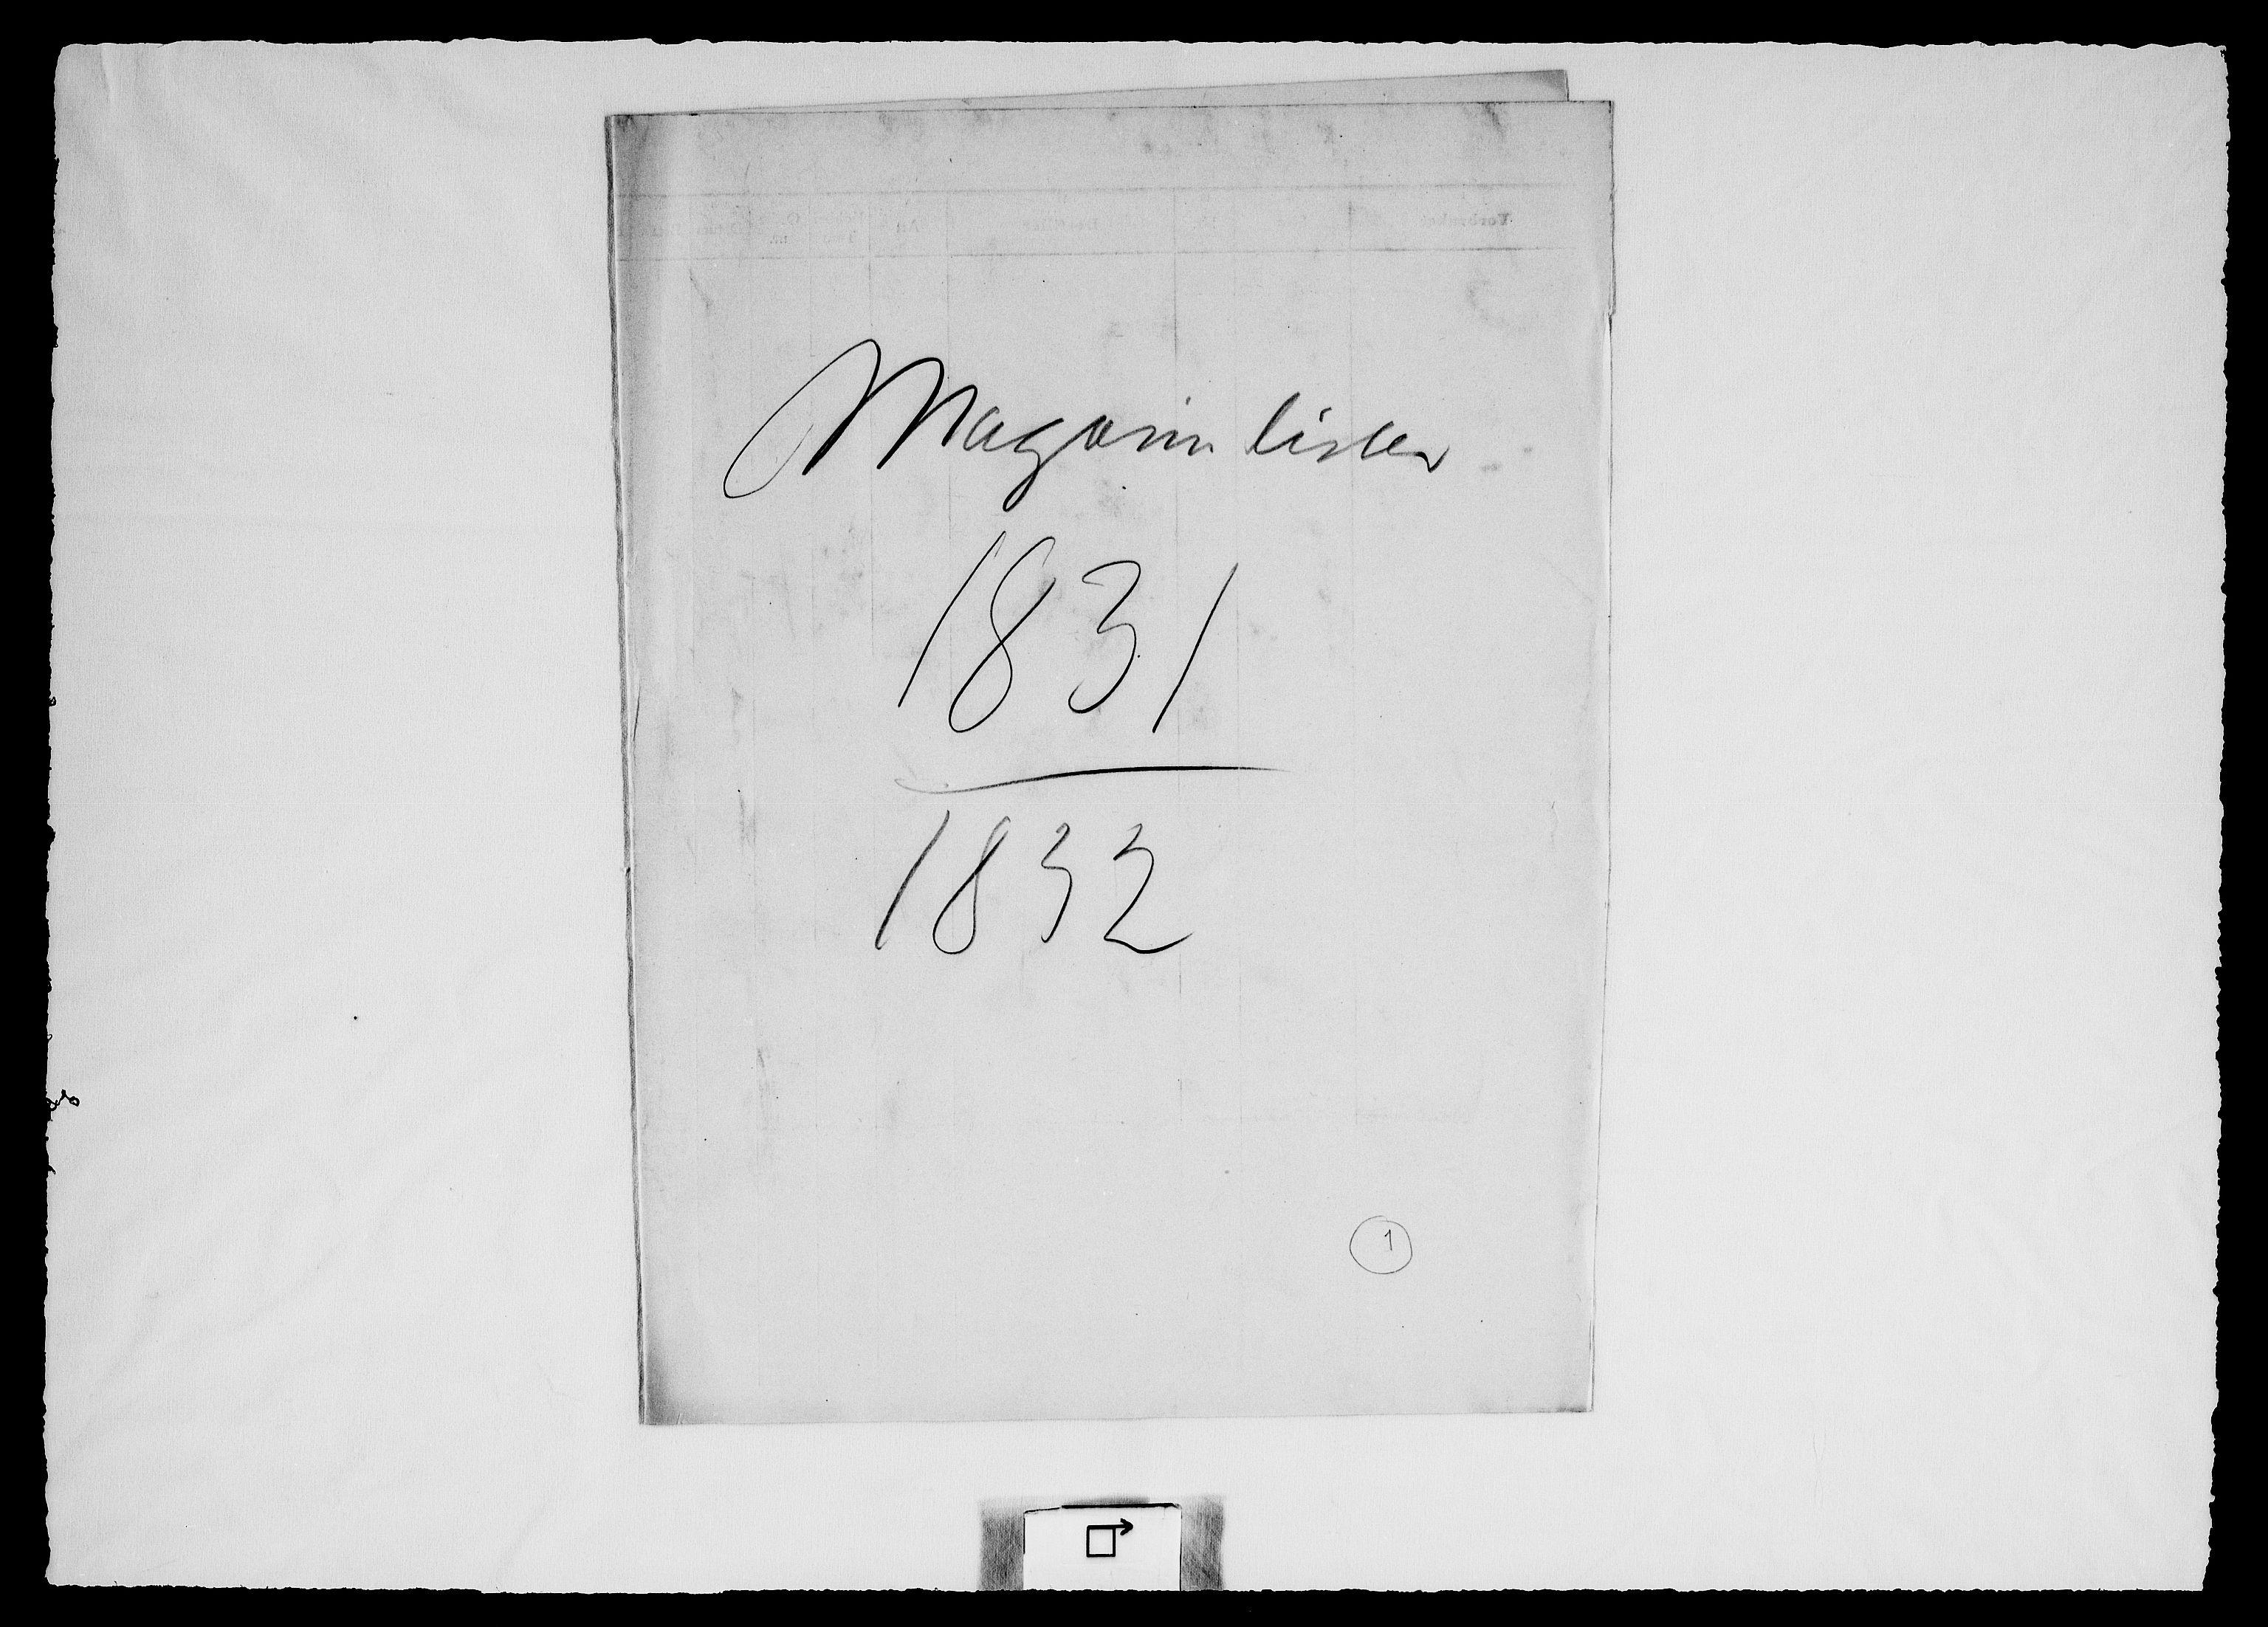 RA, Modums Blaafarveværk, G/Gd/Gdd/L0303, 1831-1836, s. 2